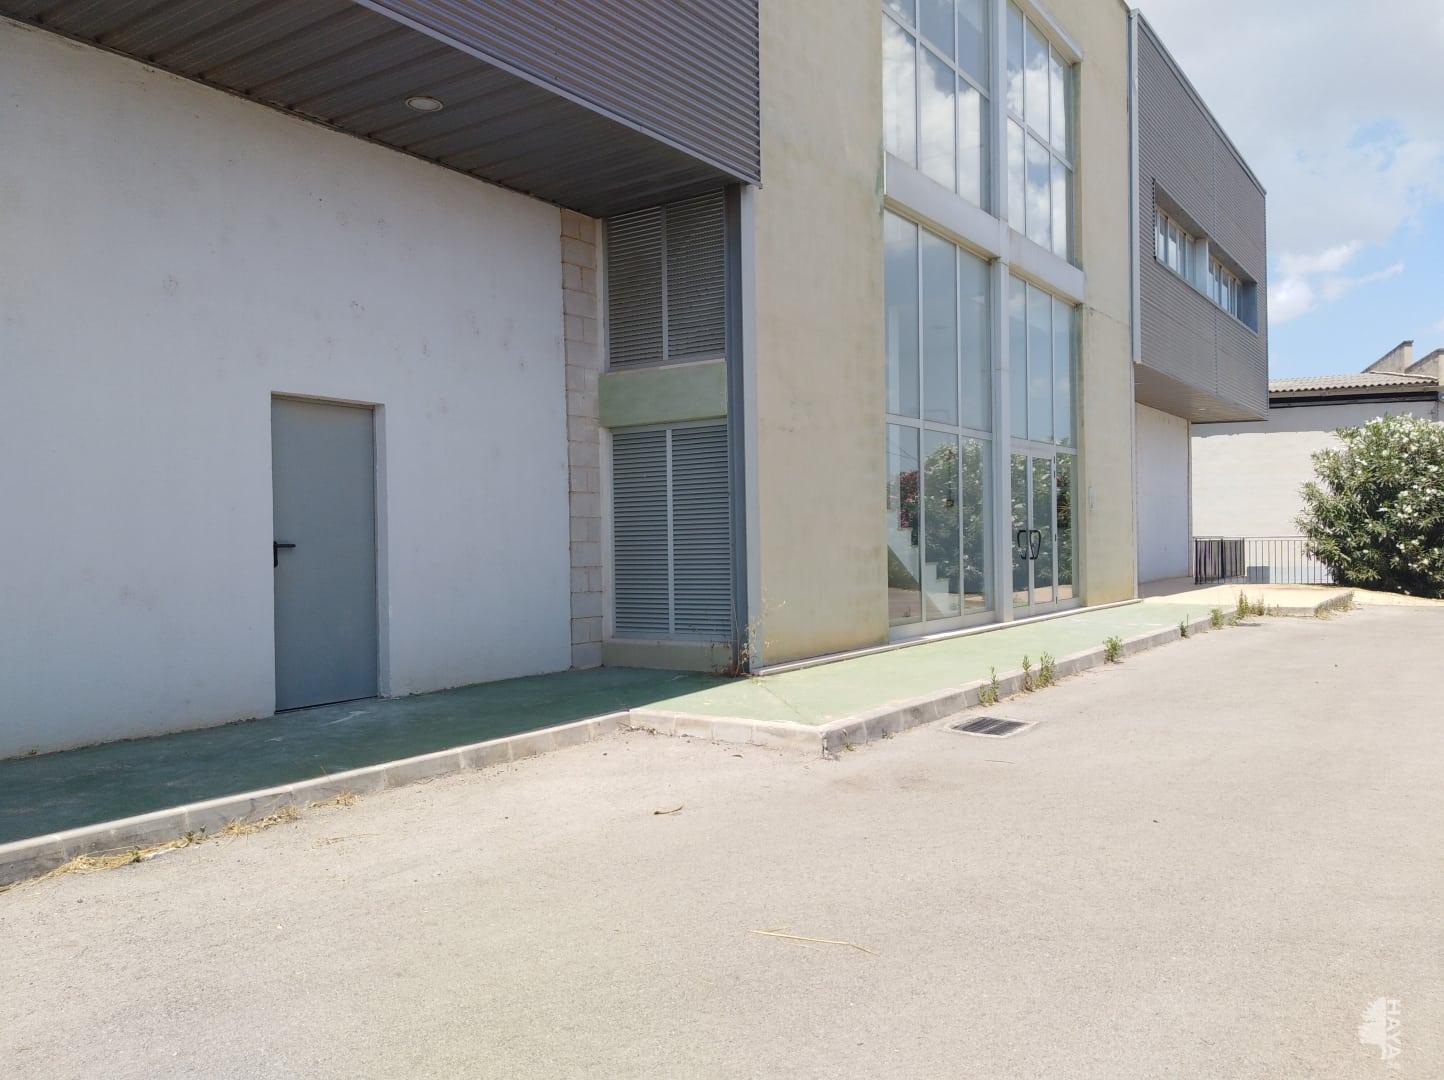 Oficina en venta en Porreres, Baleares, Carretera Campos, 123.583 €, 172 m2